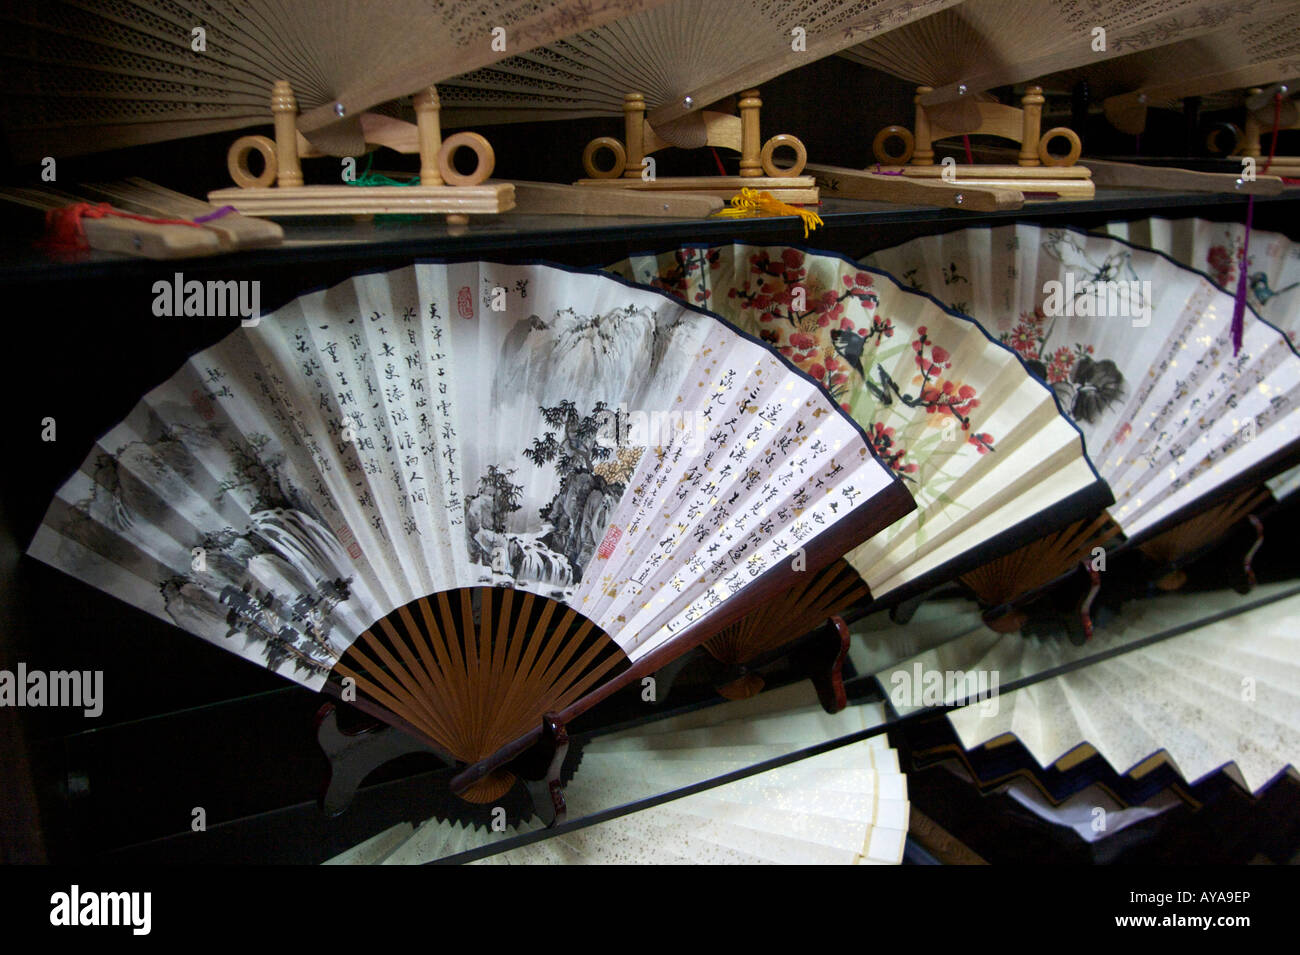 chinese fans for sale in a shop panjiayuan market beijing china